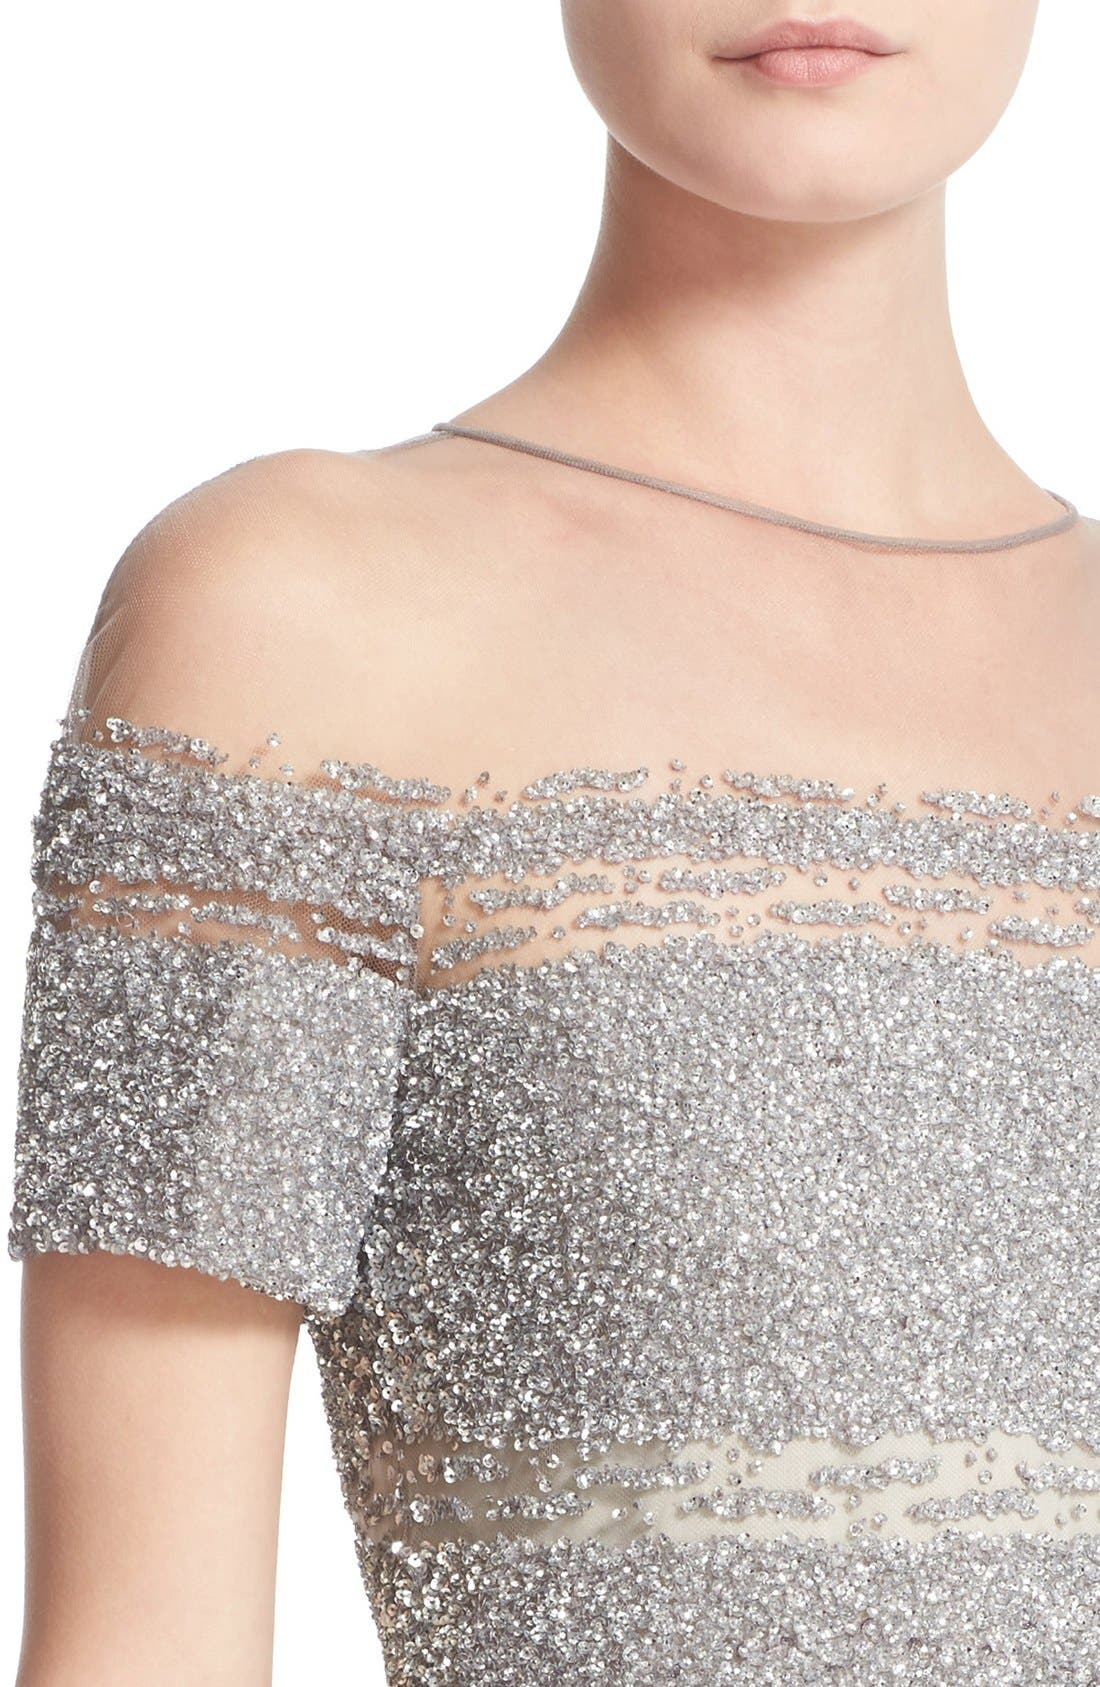 Signature Sequin Cap Sleeve Cocktail Dress,                             Alternate thumbnail 6, color,                             SILVER/ DARK GREY